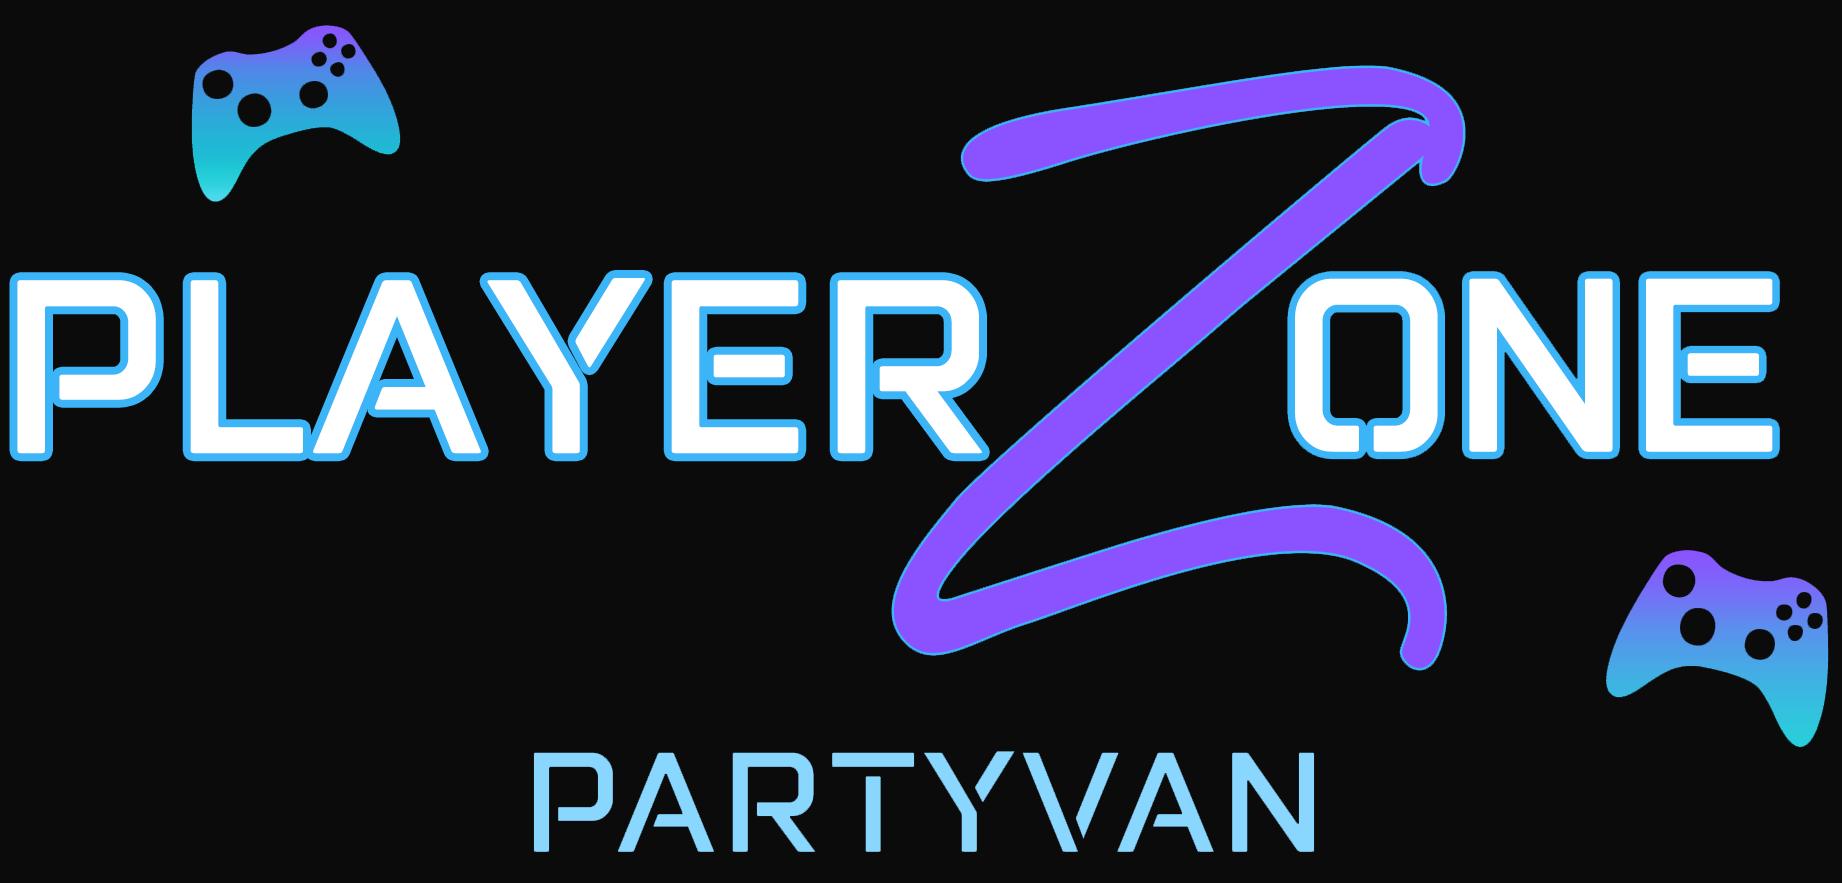 Player Zone Party Van